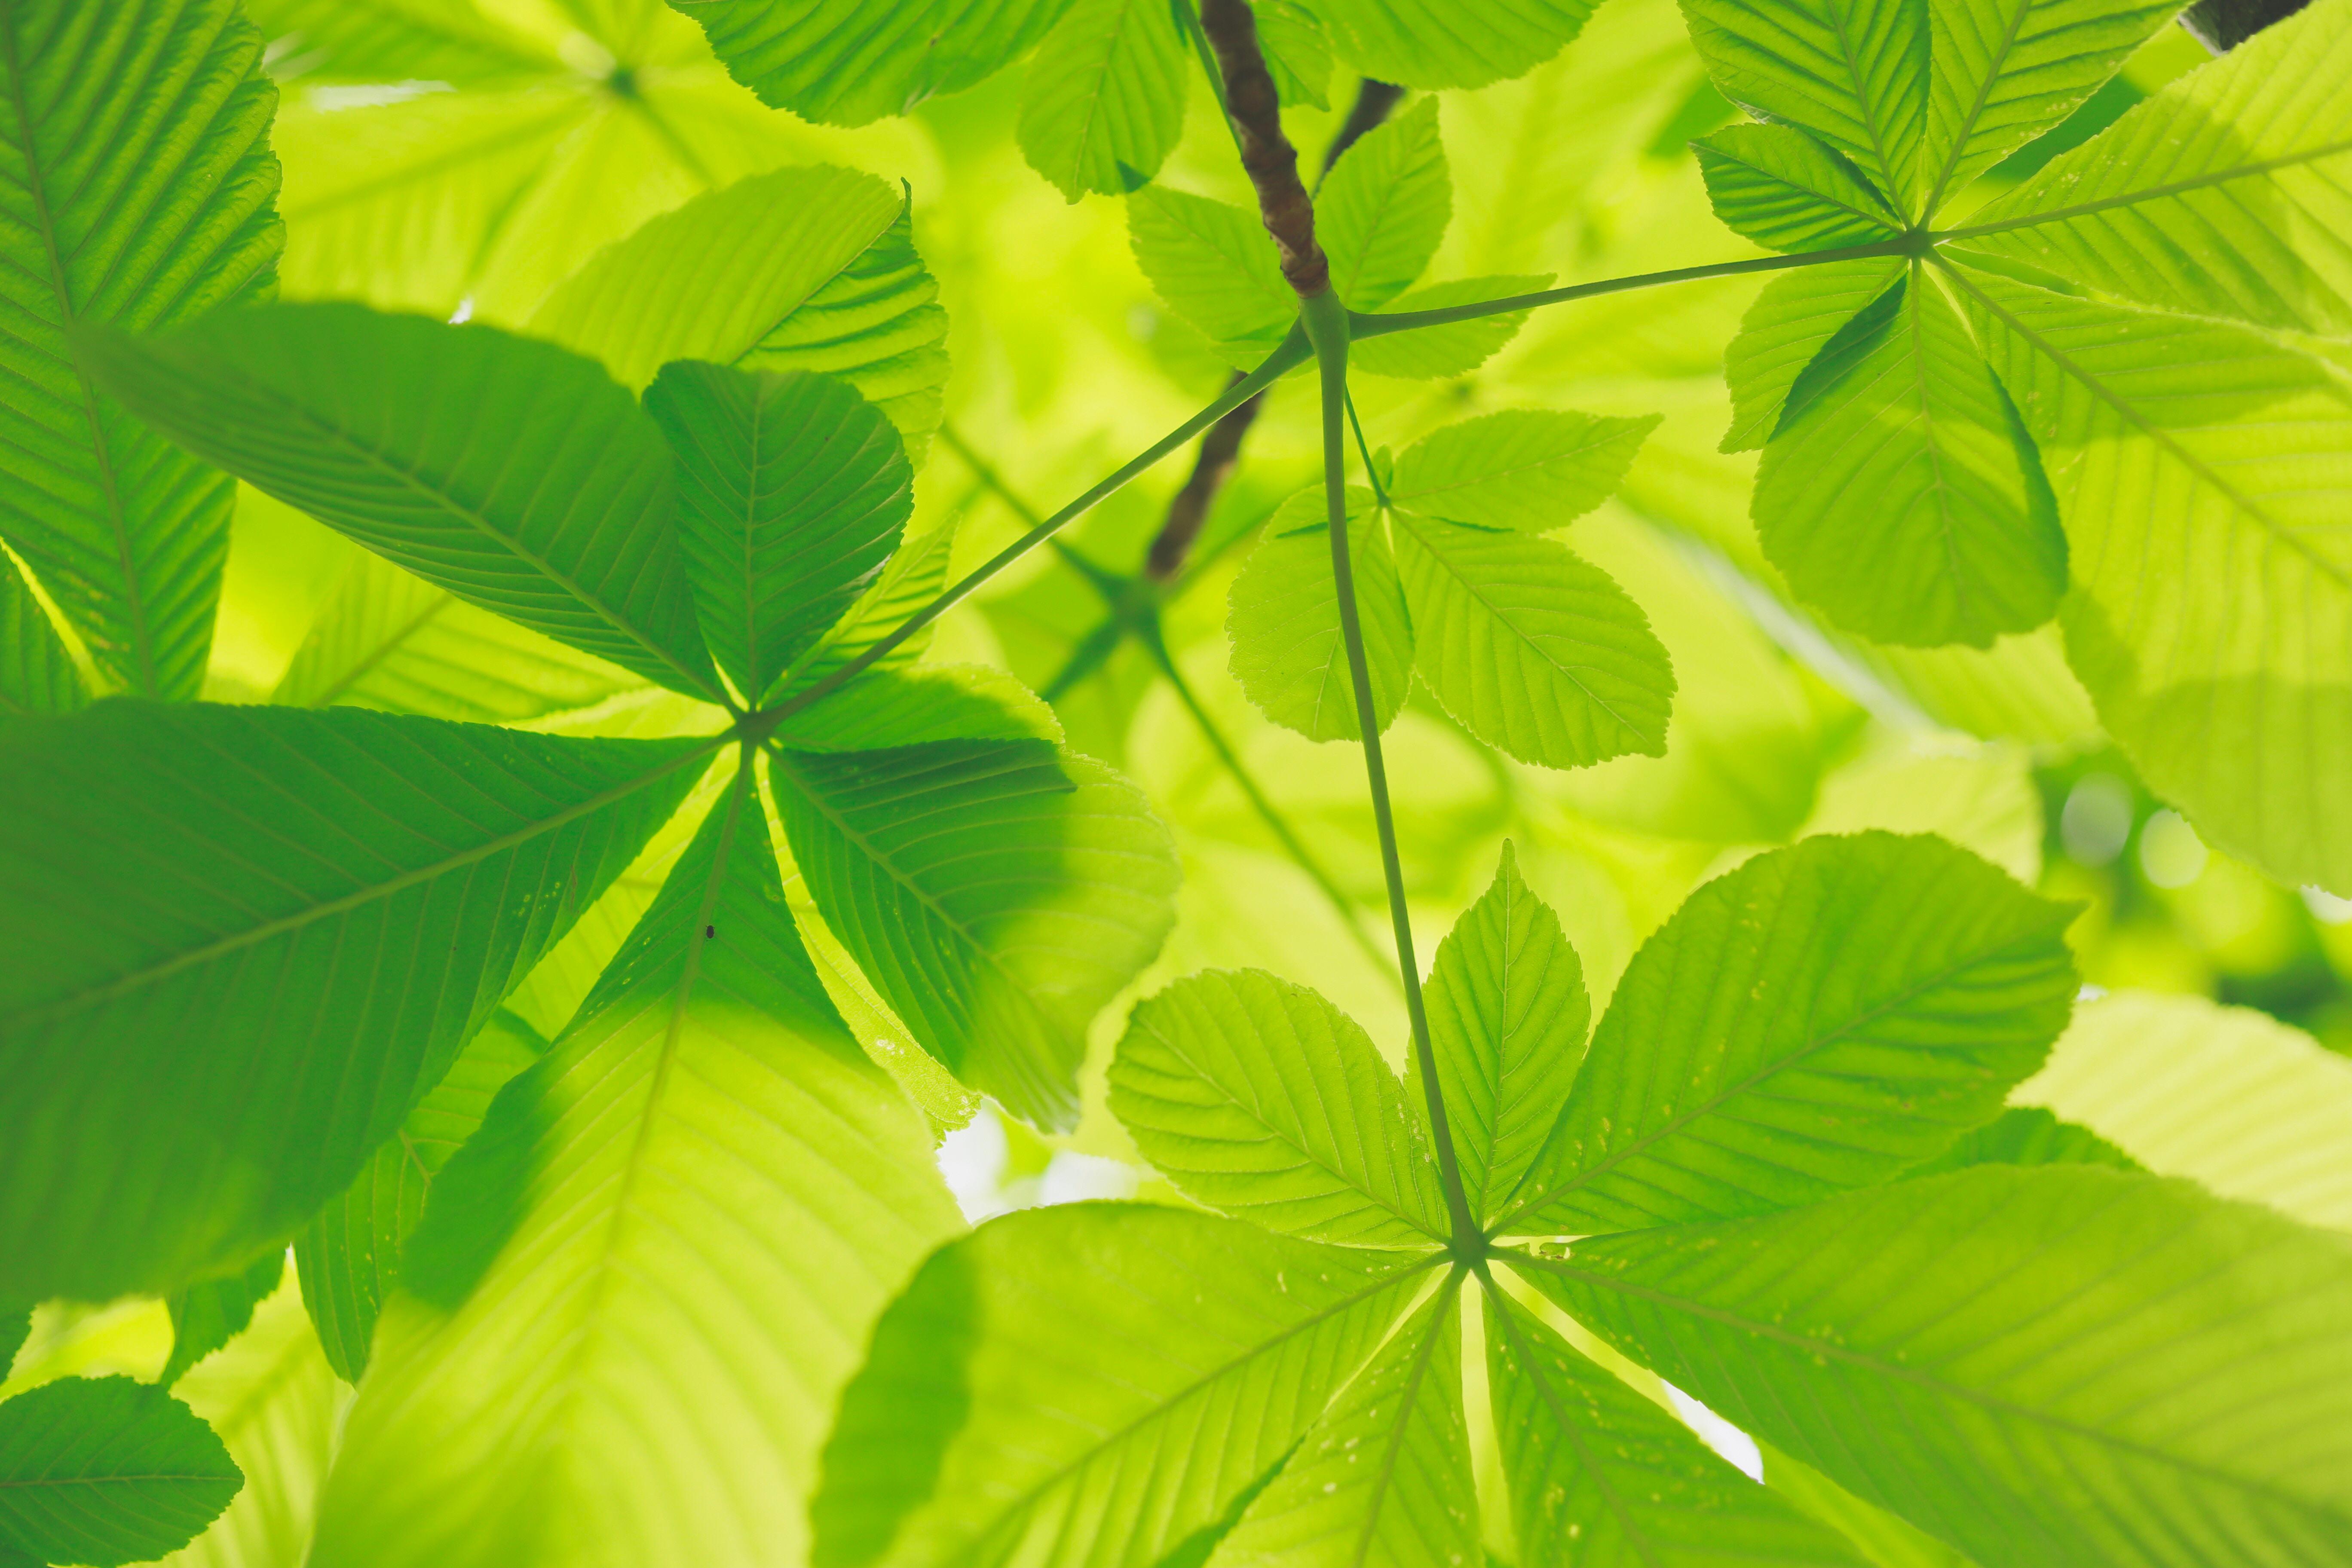 Wallpaper Green Leaves Nature Plants 5472x3648 Sam50